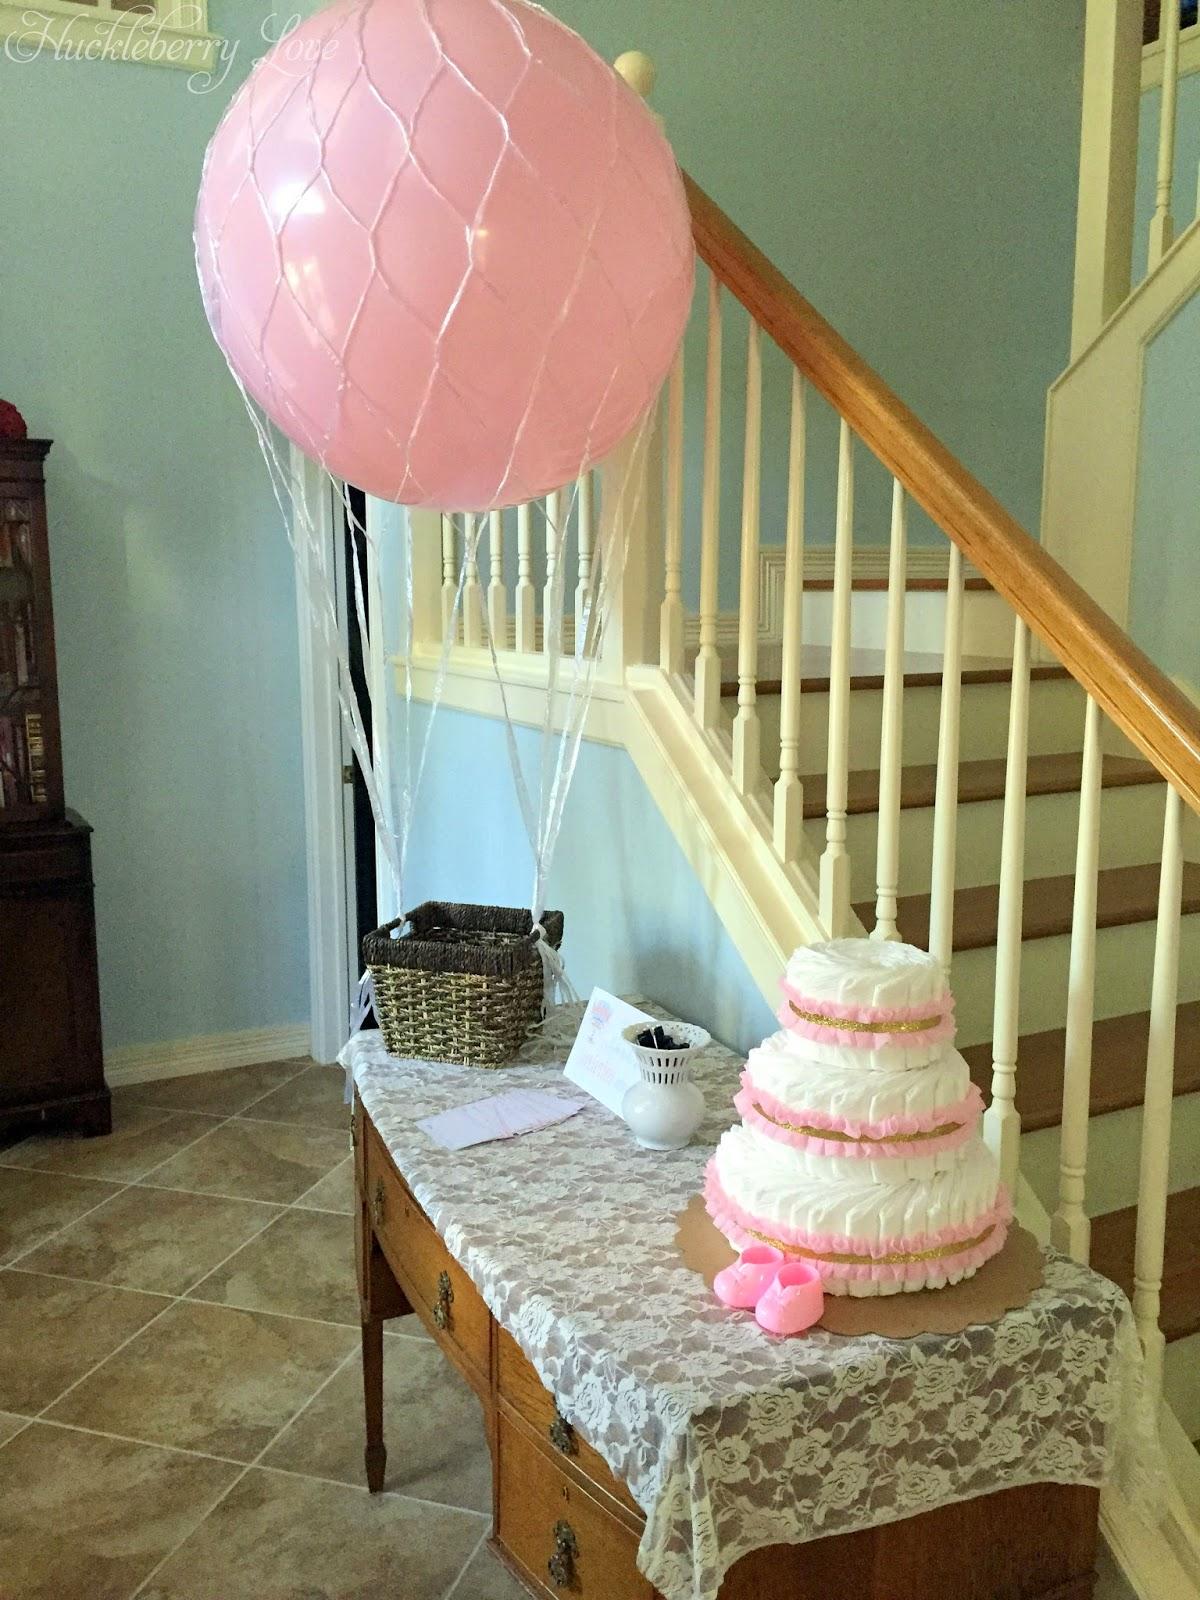 Huckleberry Love Hot Air Balloon Baby Shower